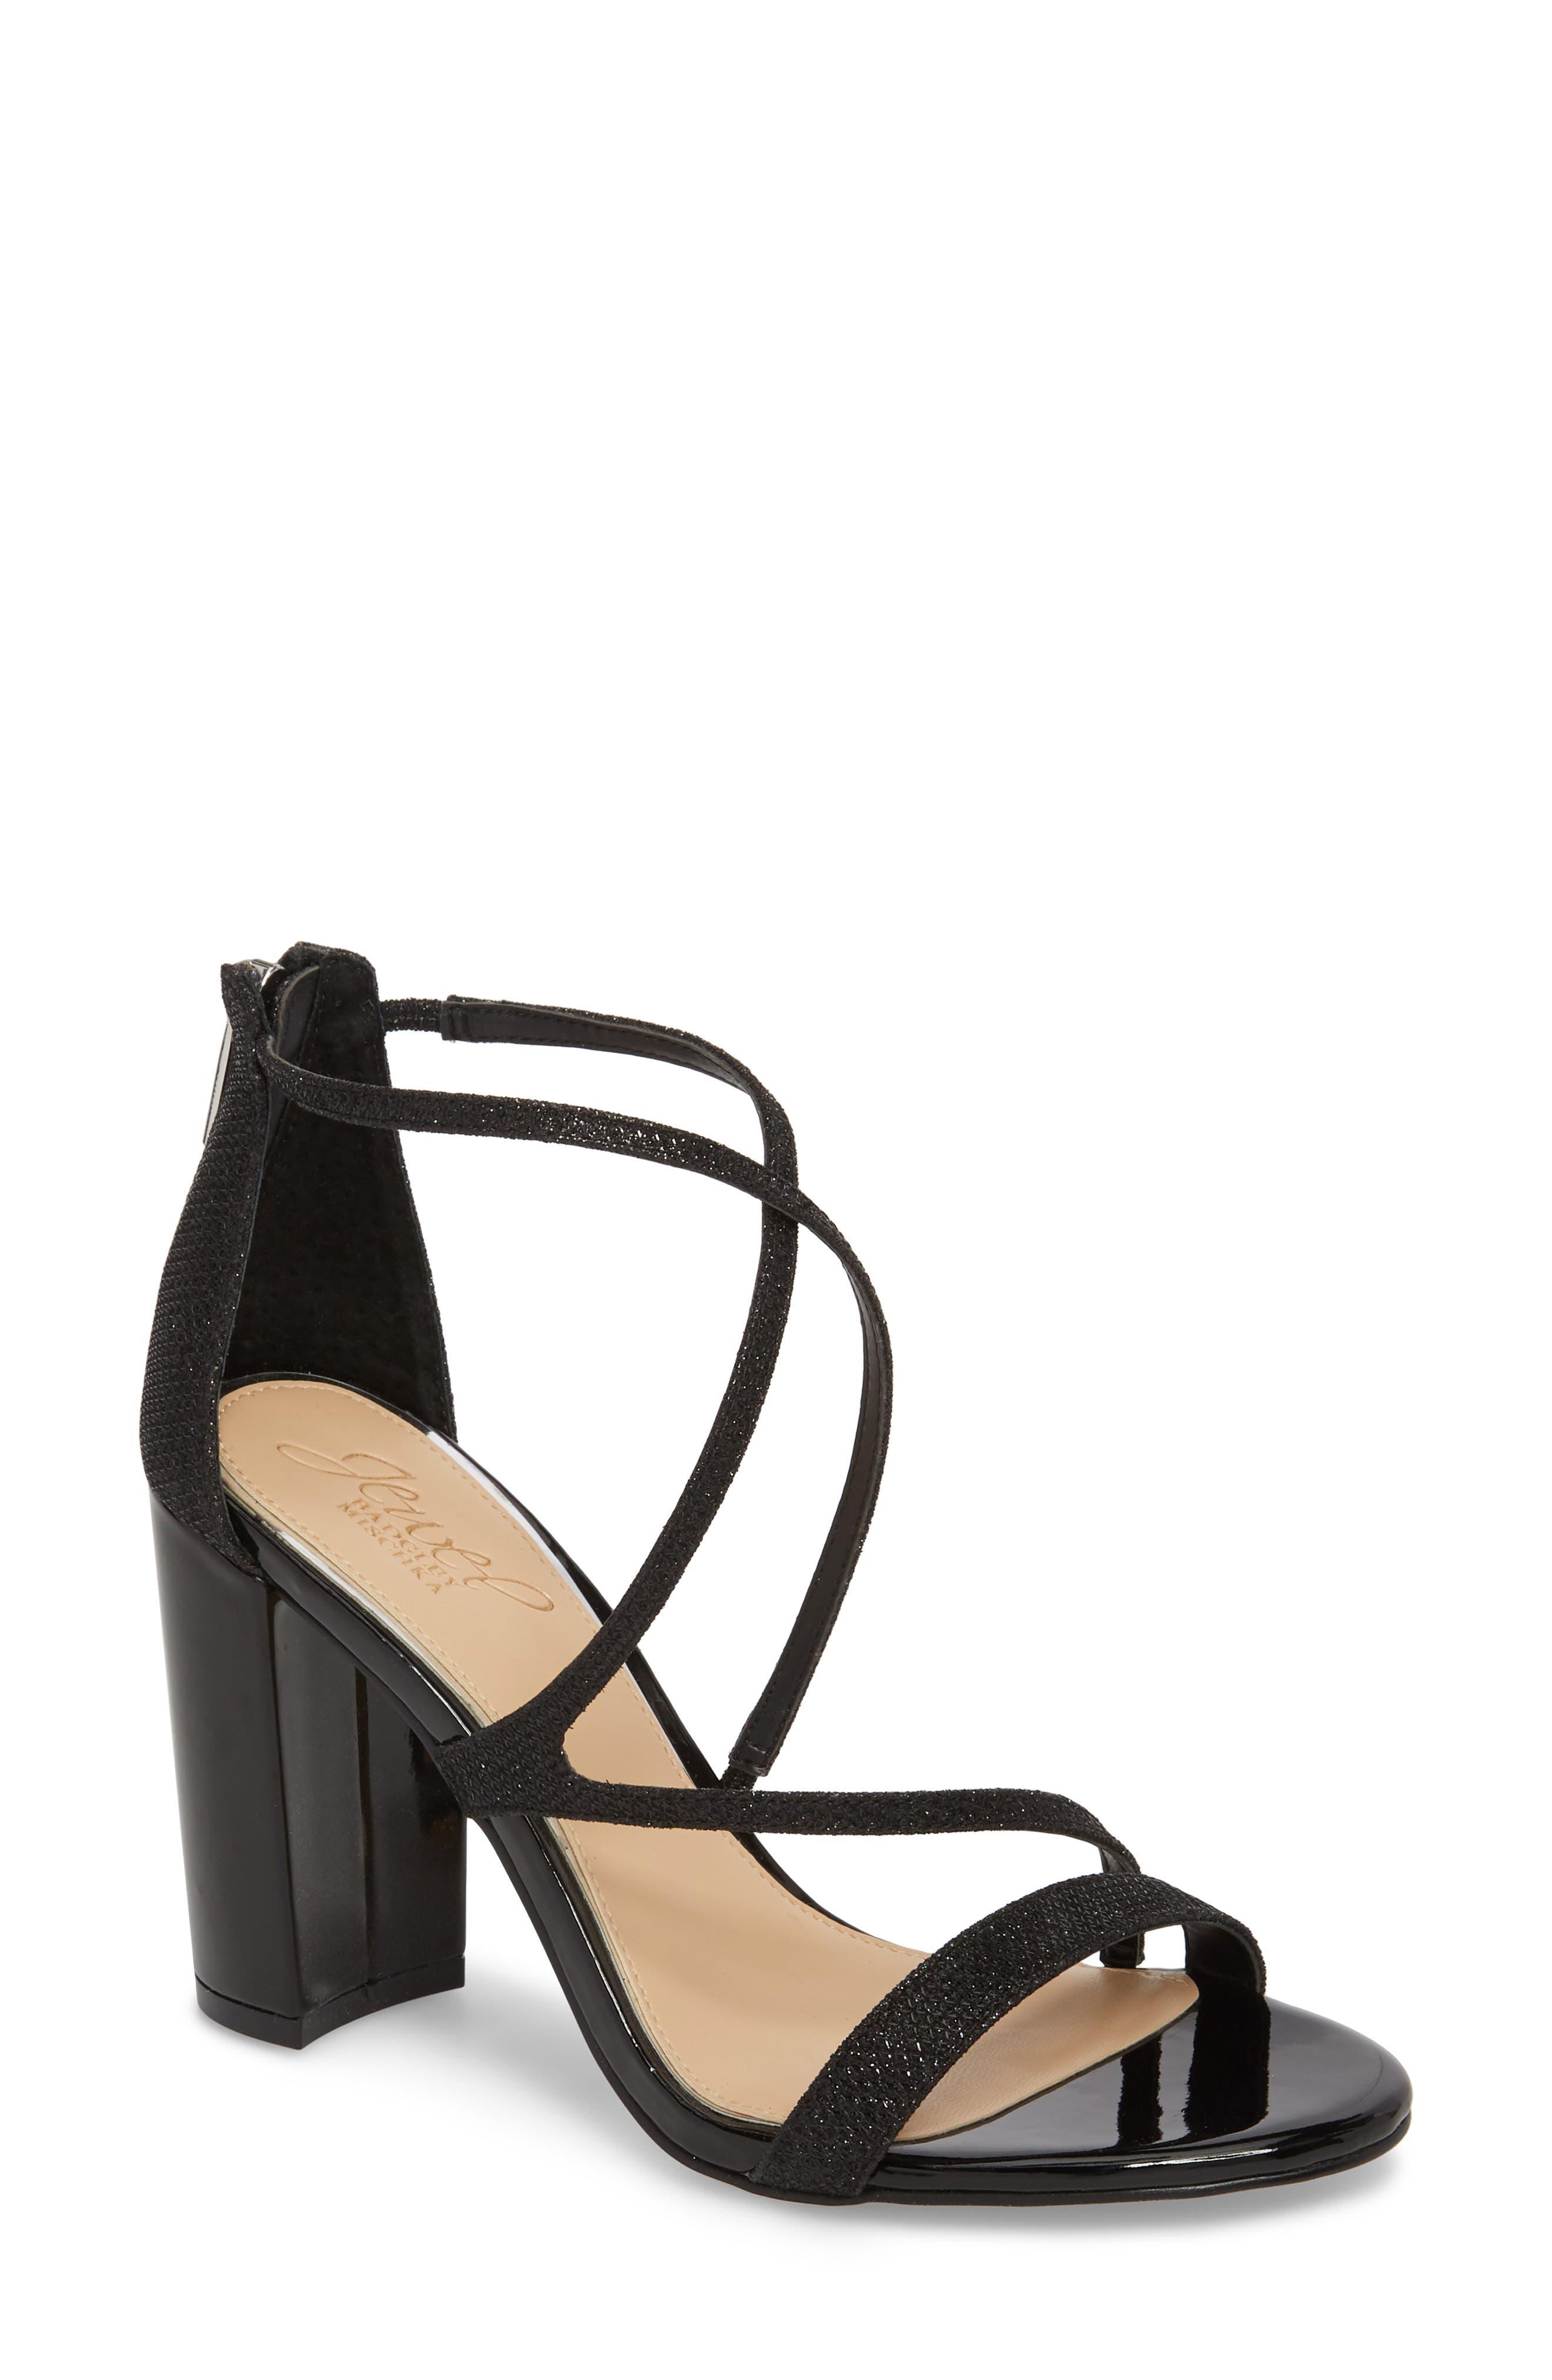 Badgley Mischka Gale Block Heel Sandal,                         Main,                         color, BLACK GLITTER FABRIC